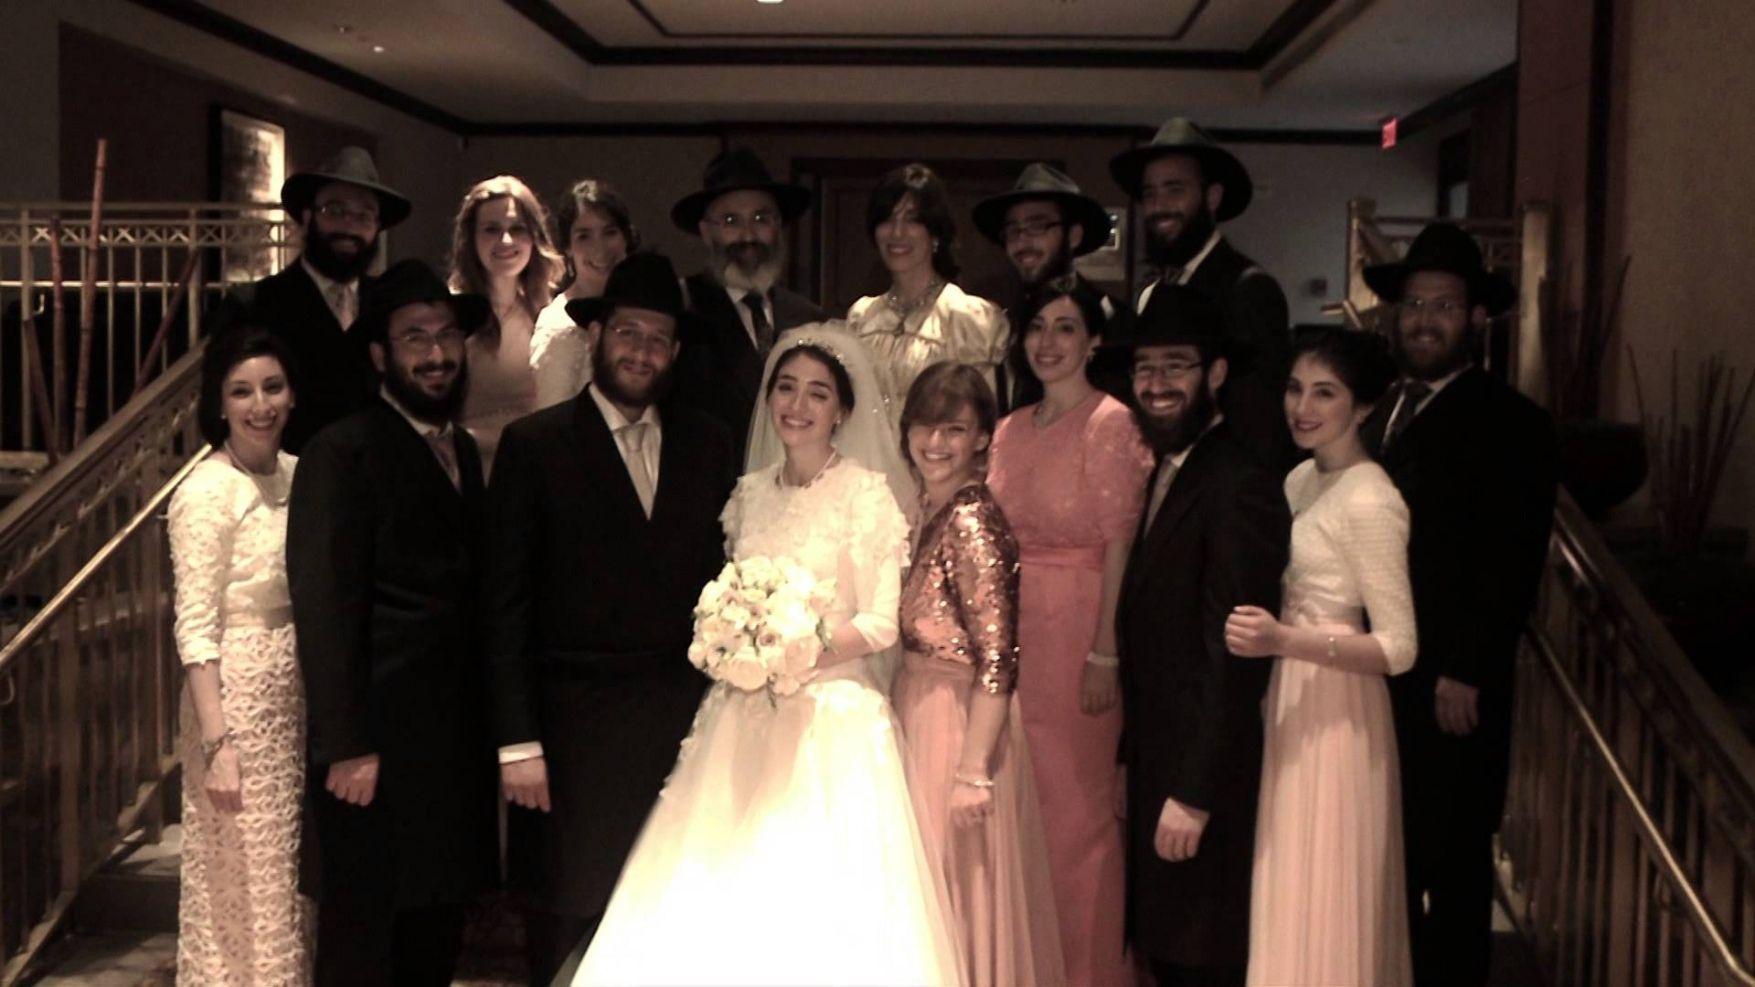 70+ orthodox Jewish Wedding Dress Code Best Dresses for